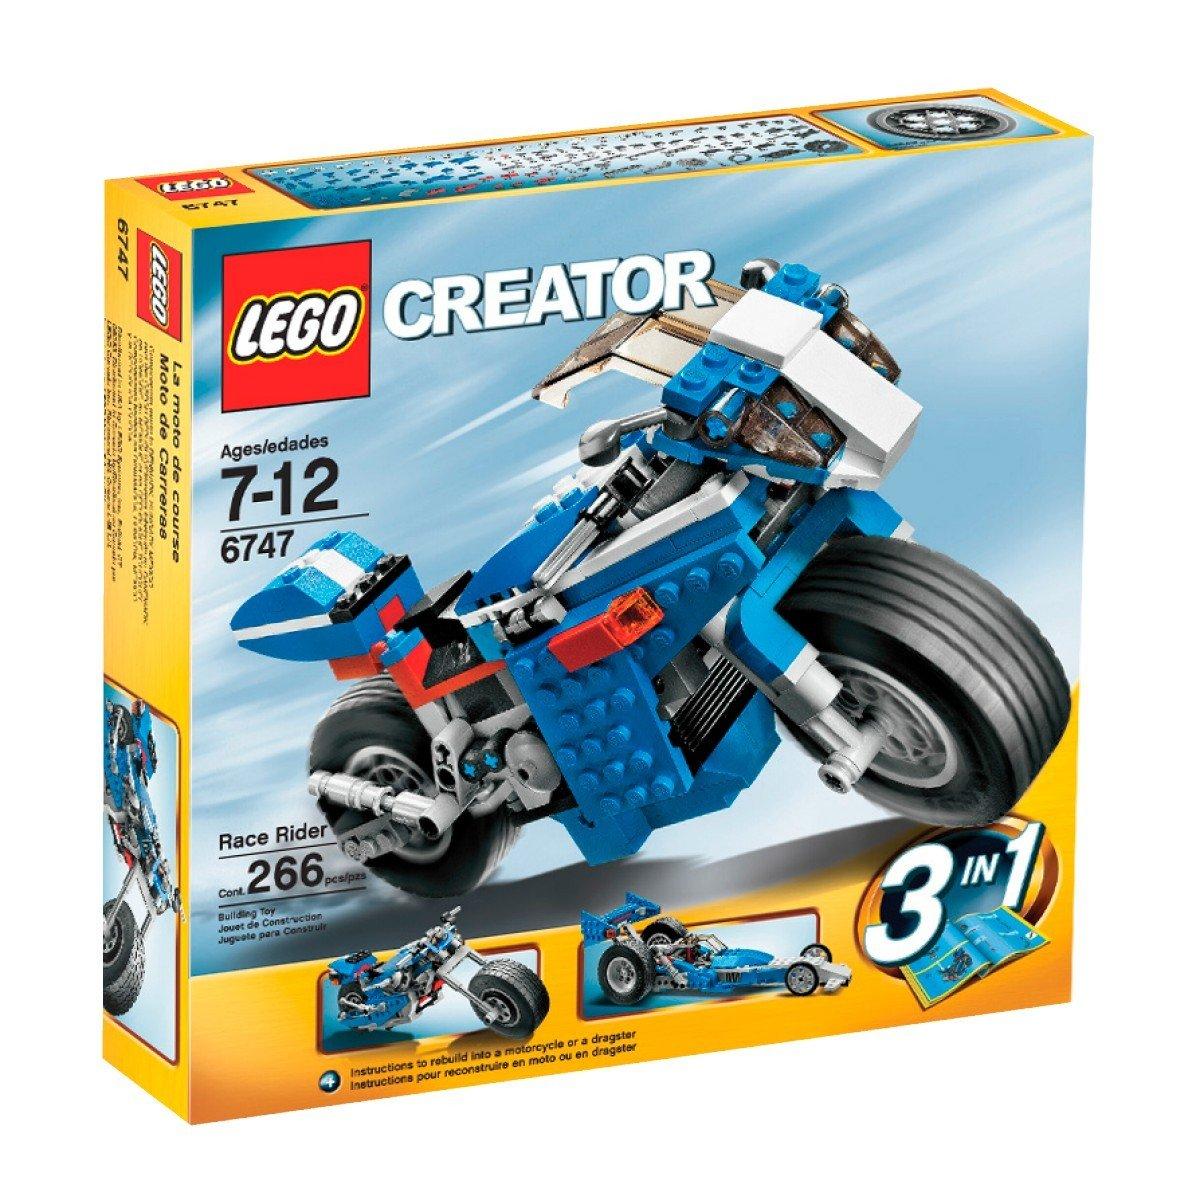 Amazoncom Lego Creator Race Rider Toys Games